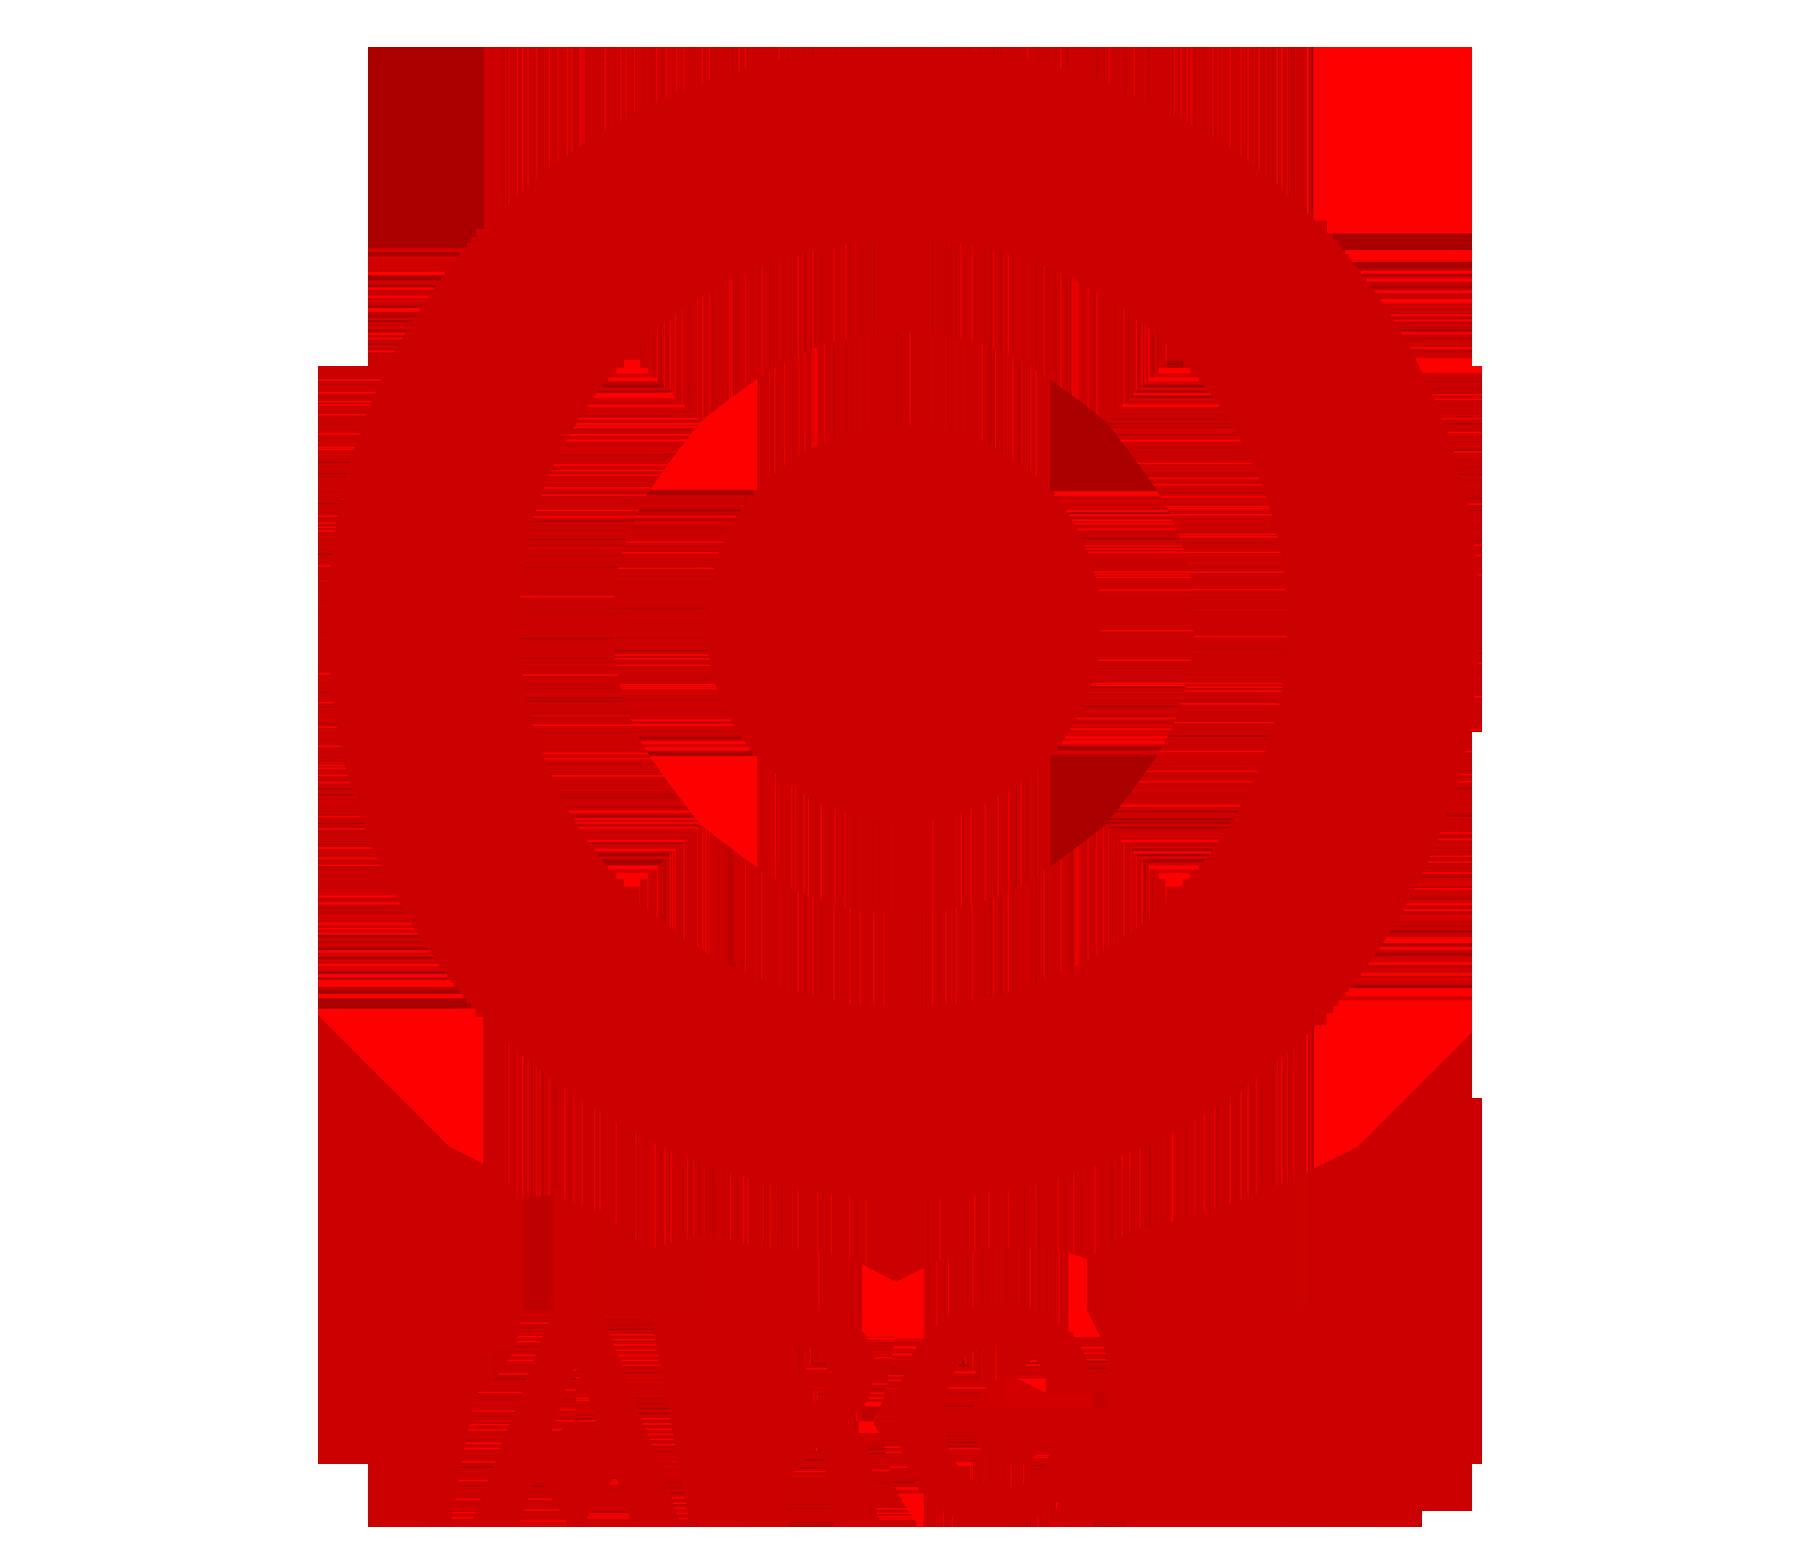 Target 01.png